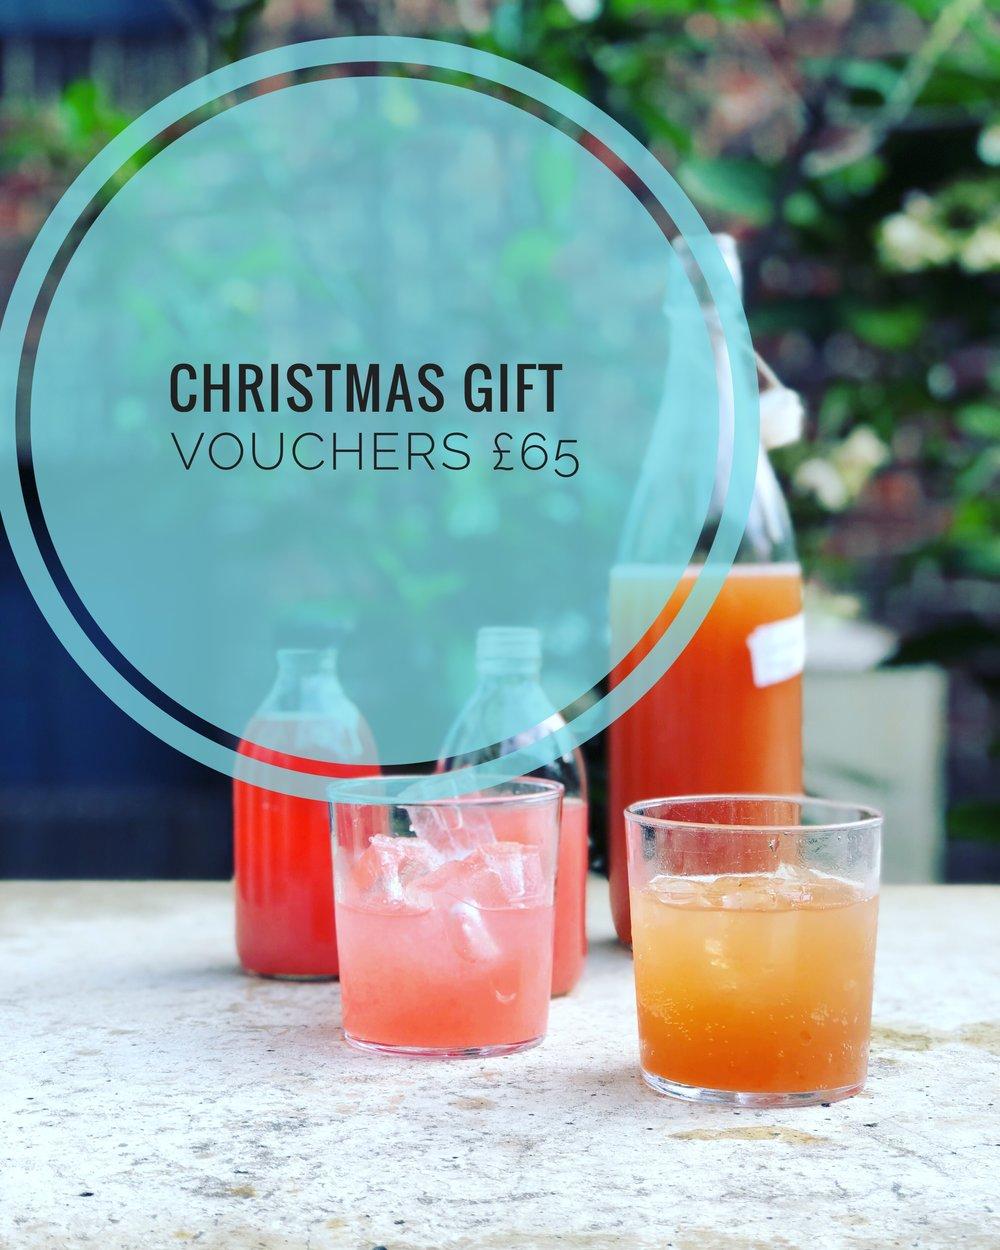 christmas gift voucher 65 little duck the picklery